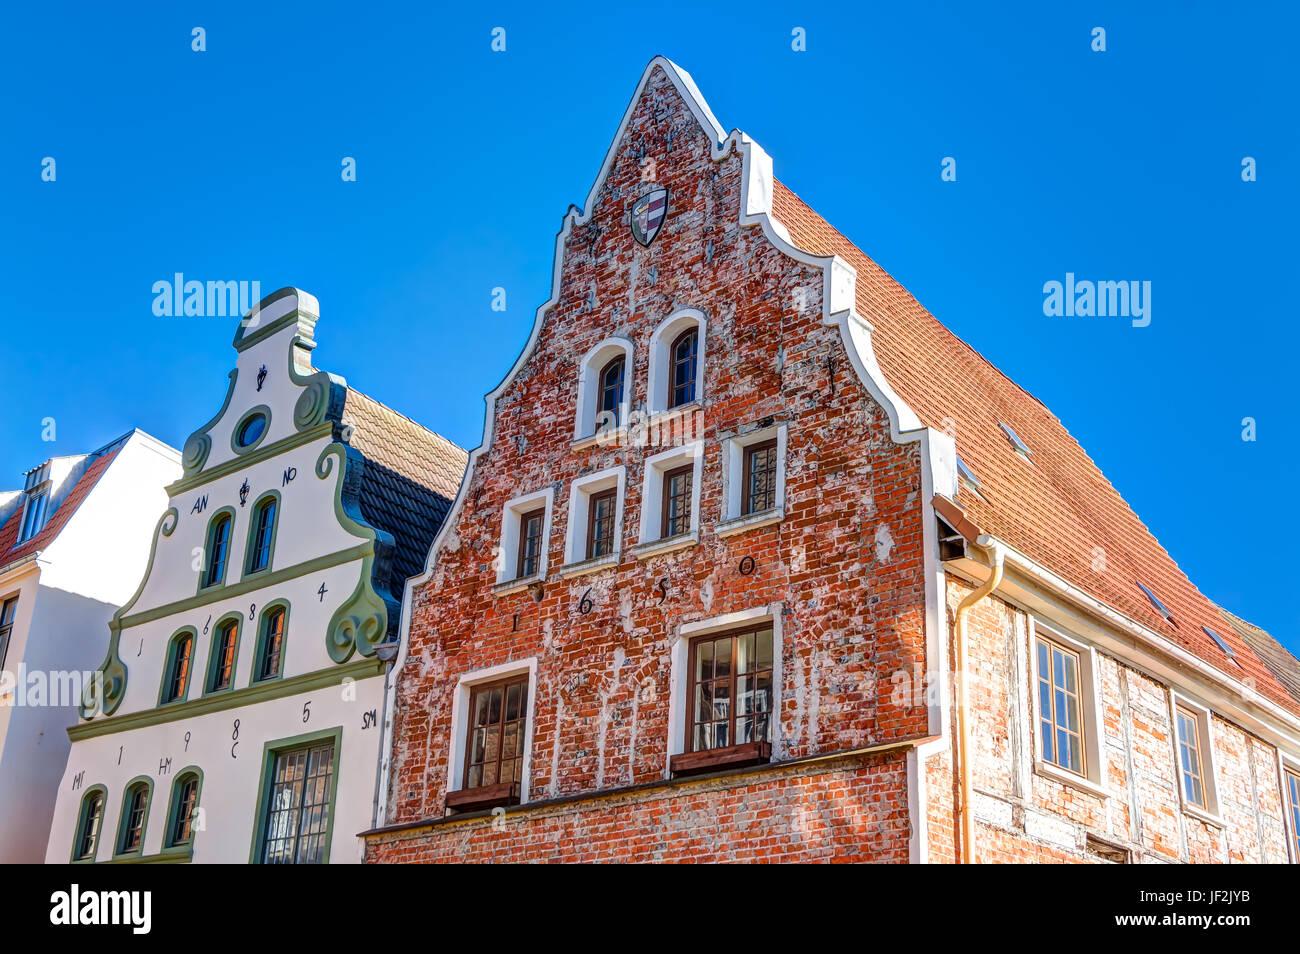 Historic buildings in Wismar Stock Photo